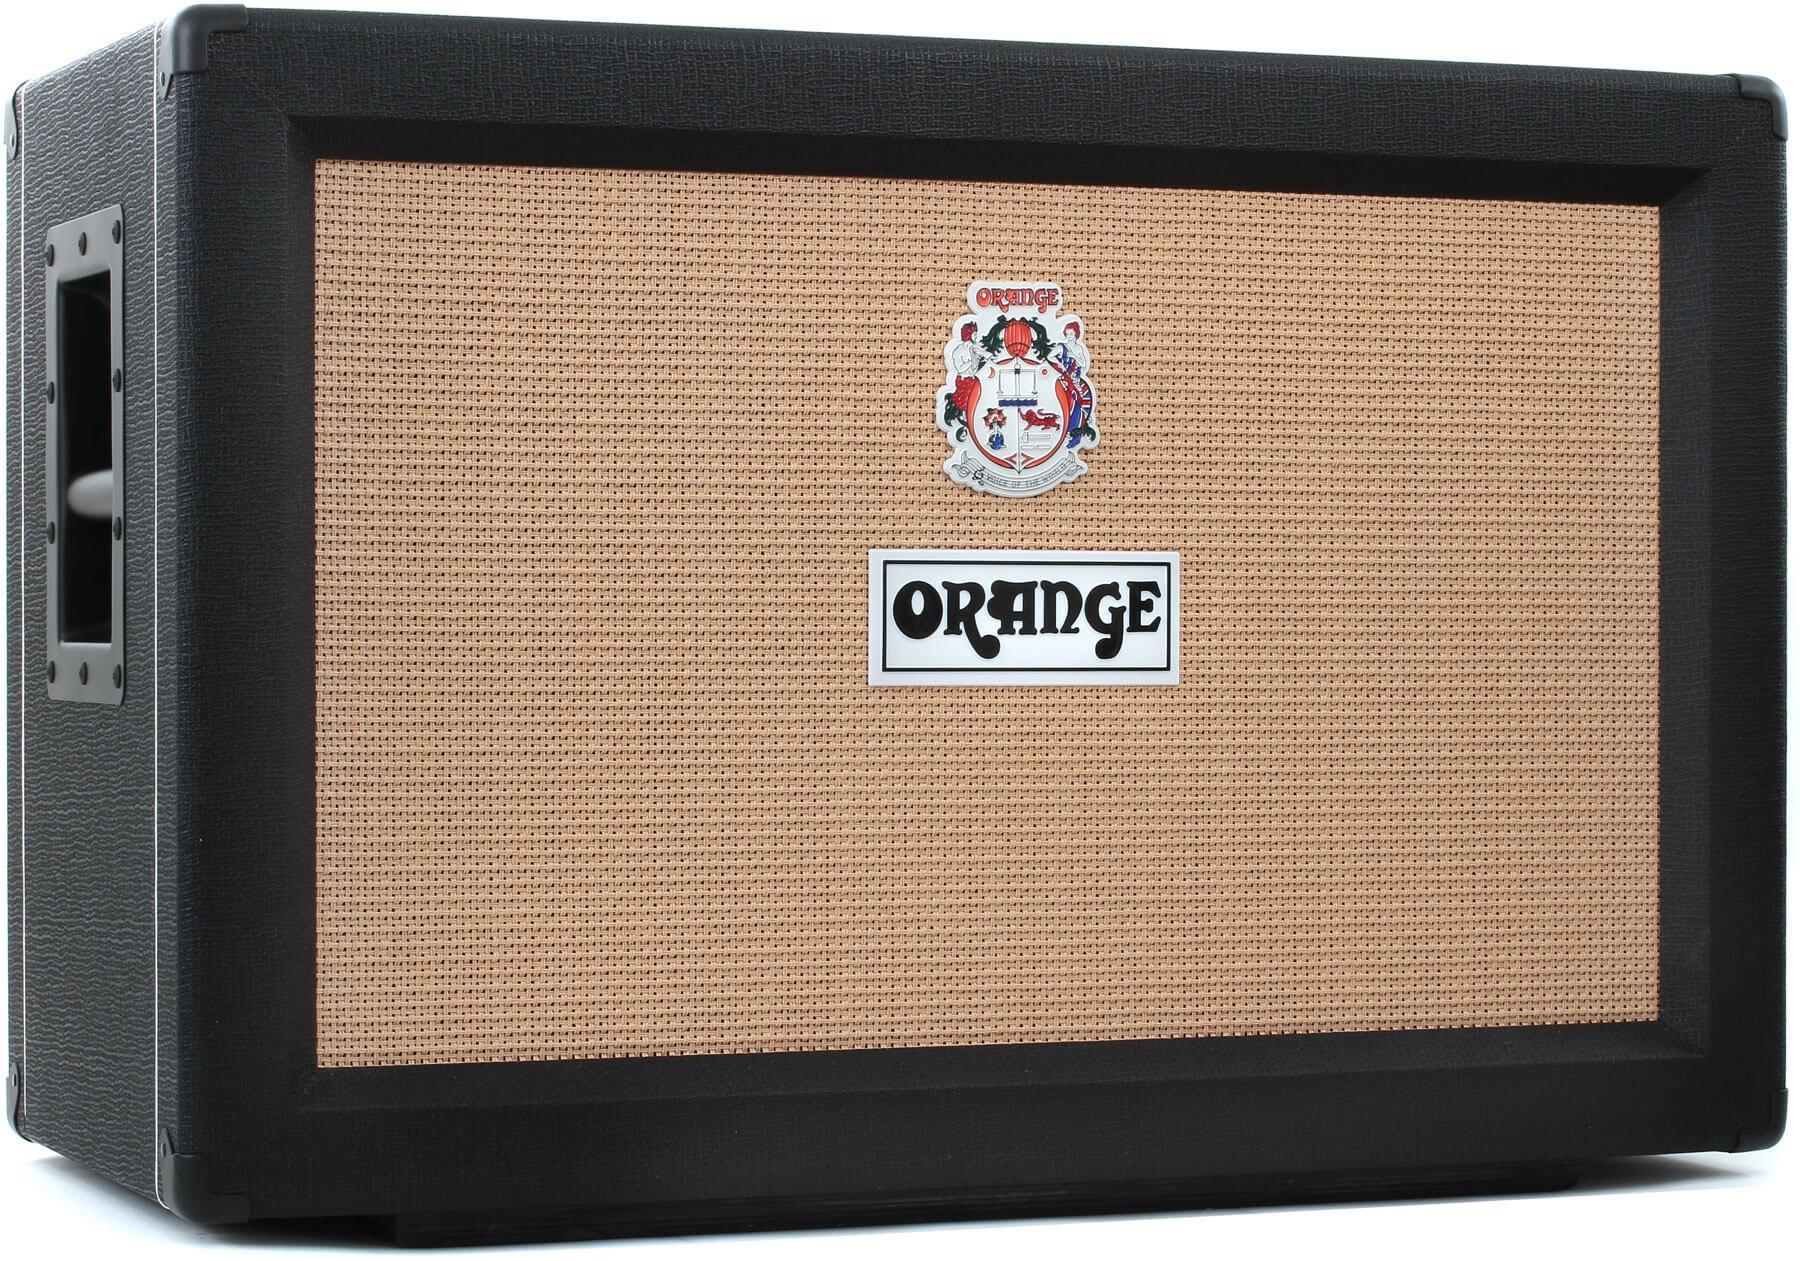 Caja Acústica Amplificador Guitarra Orange Ppc212 Bk